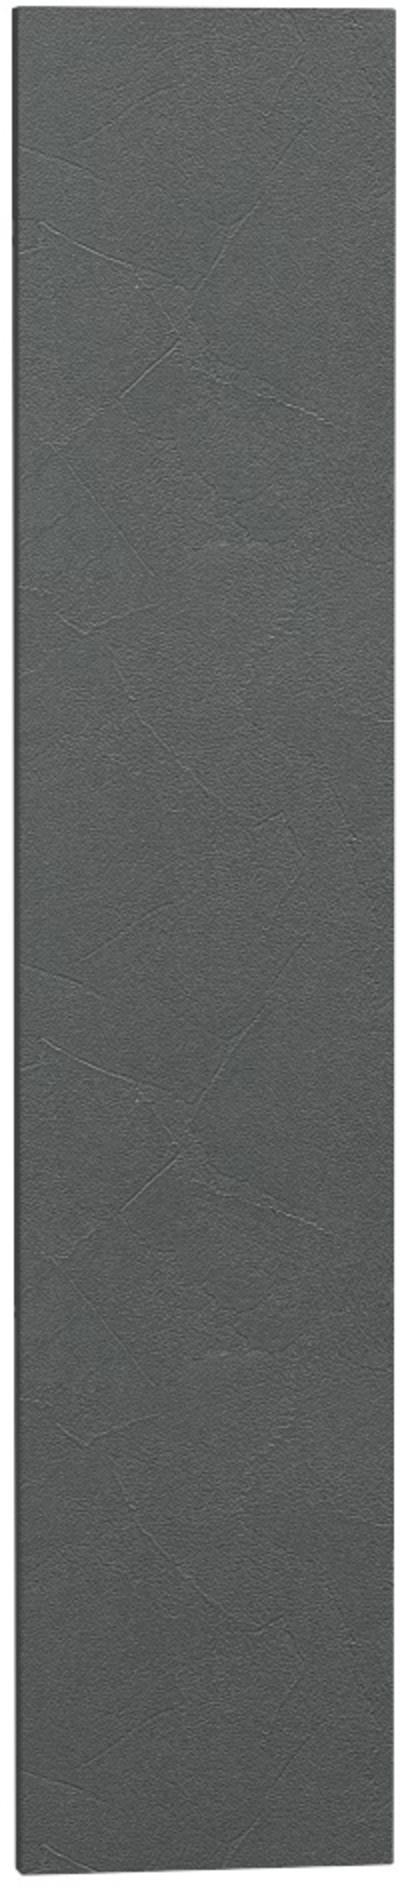 BlanKit F15 Concrete gray.352 Köögikapi uksed